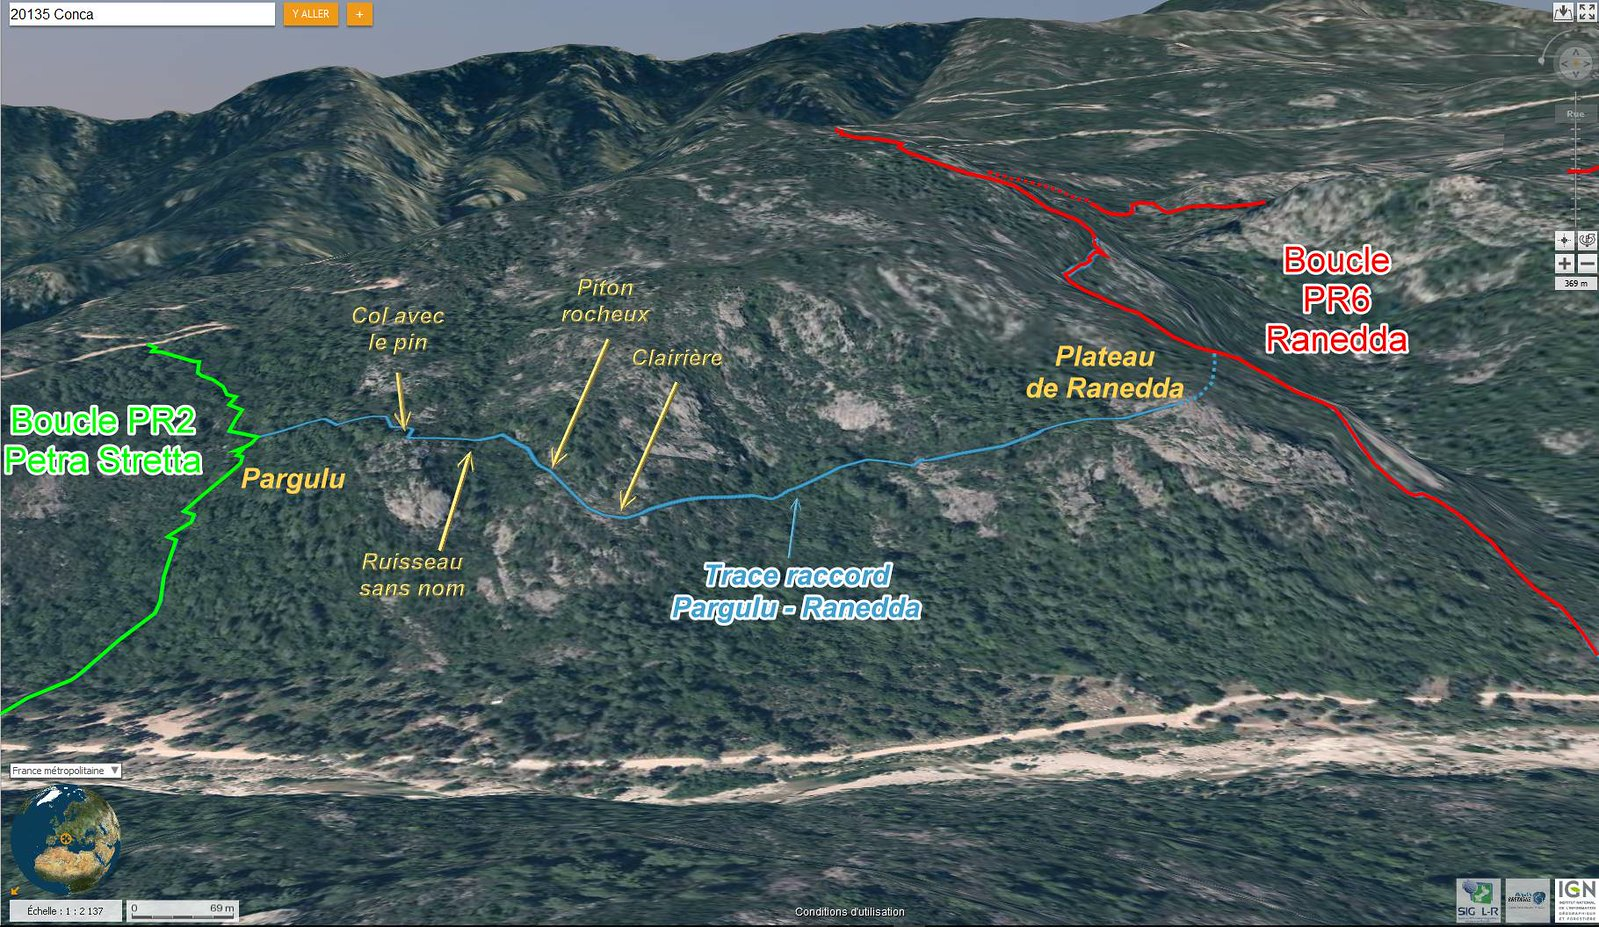 Photo aérienne 3D de la trace de raccordement entre Costa di u Pargulu (boucle Petra Stretta/PR2) et le plateau de Ranedda (proche de la boucle Ranedda/PR6)